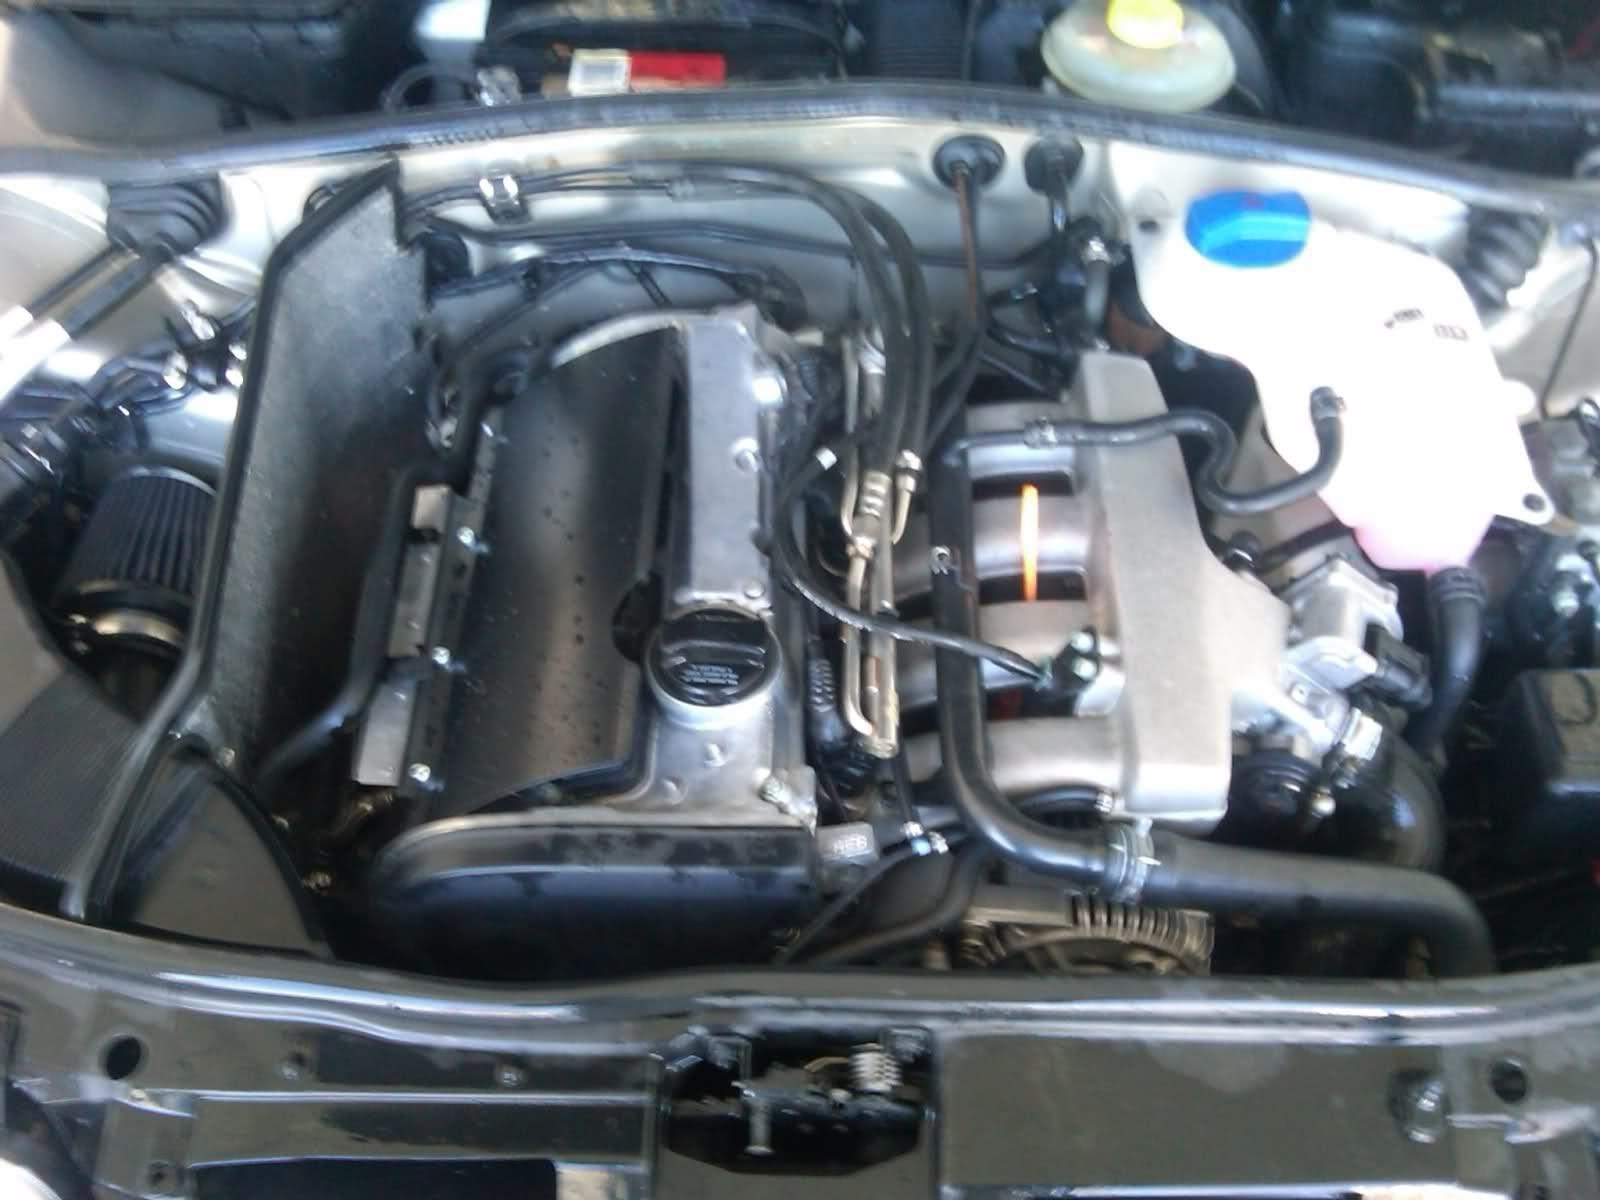 Audi A4 1 8 T Engine Diagram Show Me Your Engine Bay Page 6 Of Audi A4 1 8 T Engine Diagram